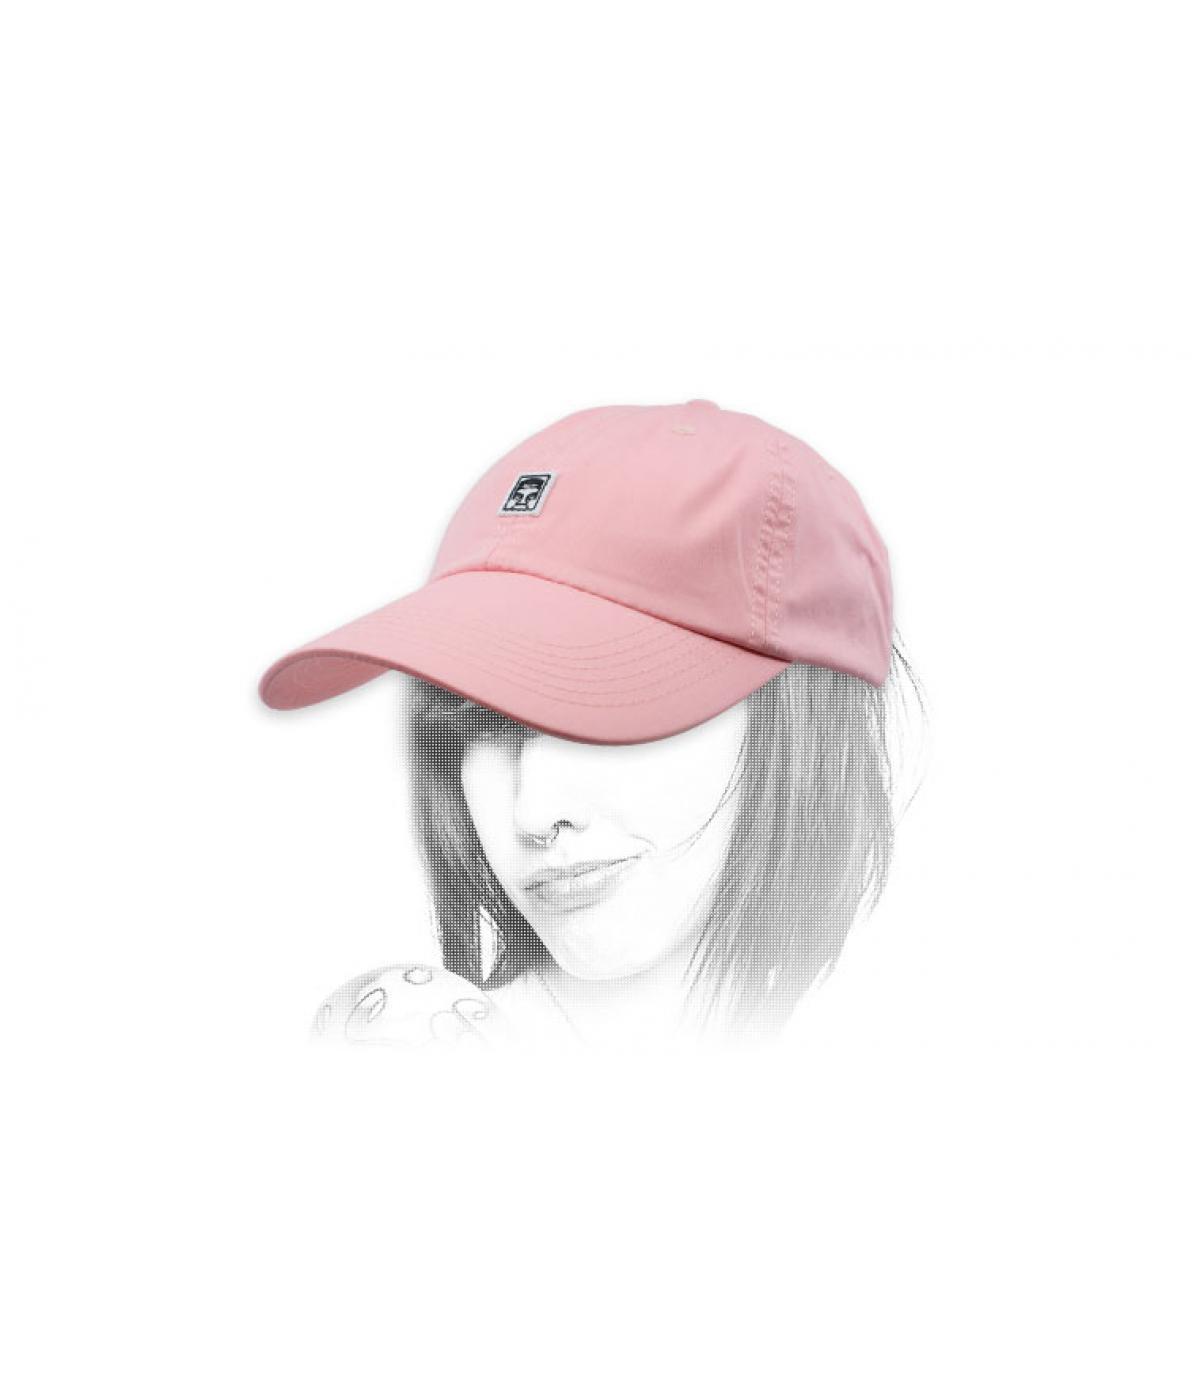 gorra rosa Obey gigante